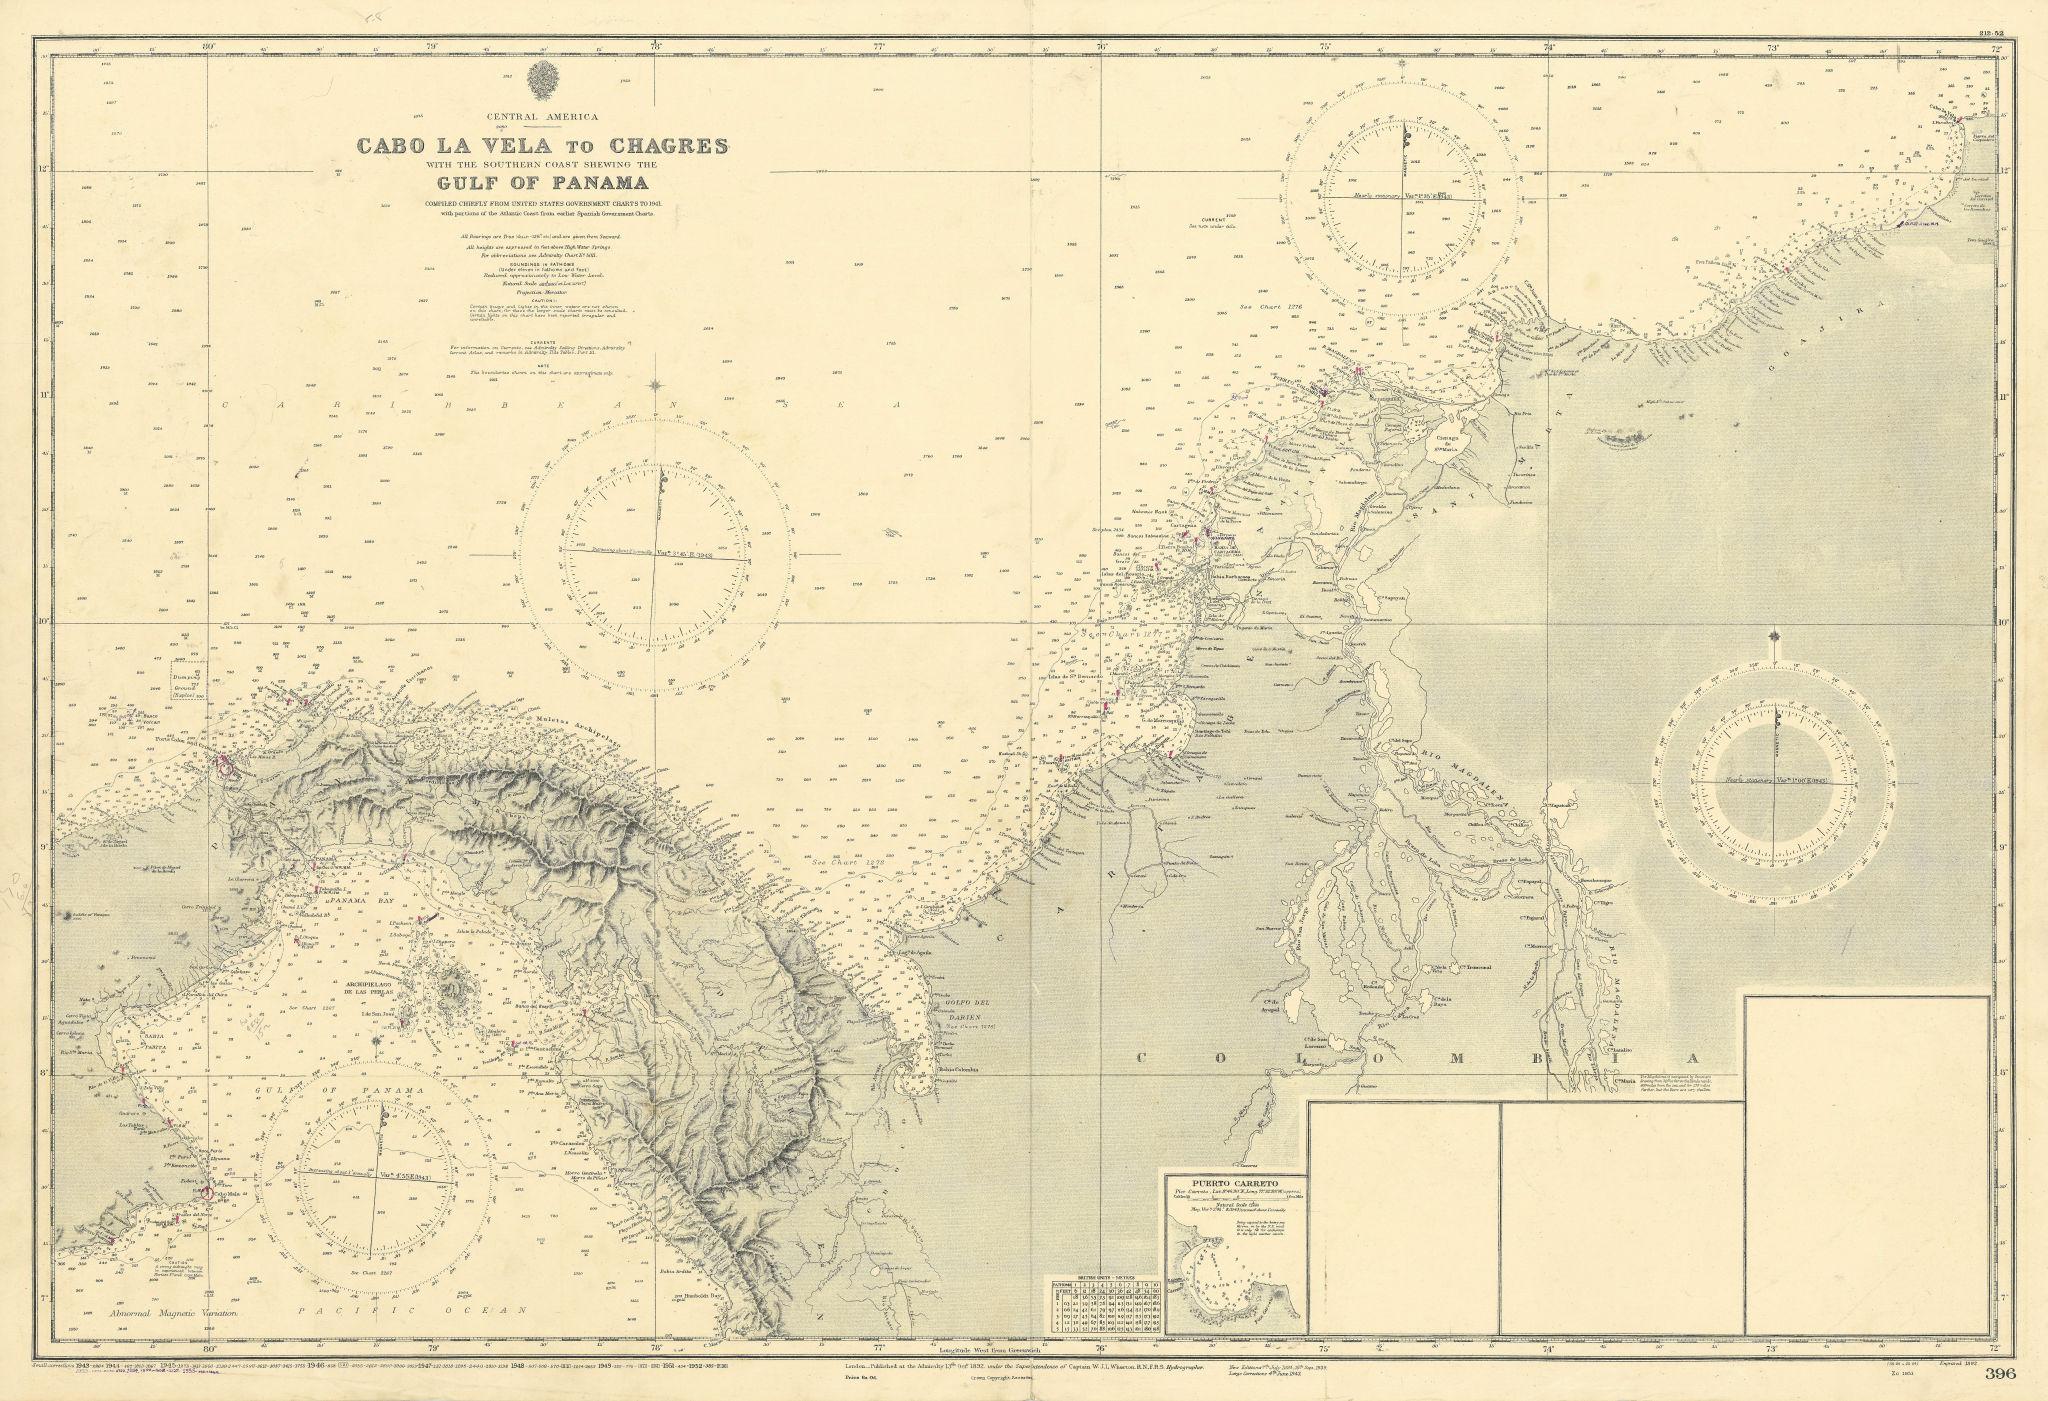 Panama Colombia coast. Cabo la Vela-Chagres. ADMIRALTY sea chart 1892 (1955) map